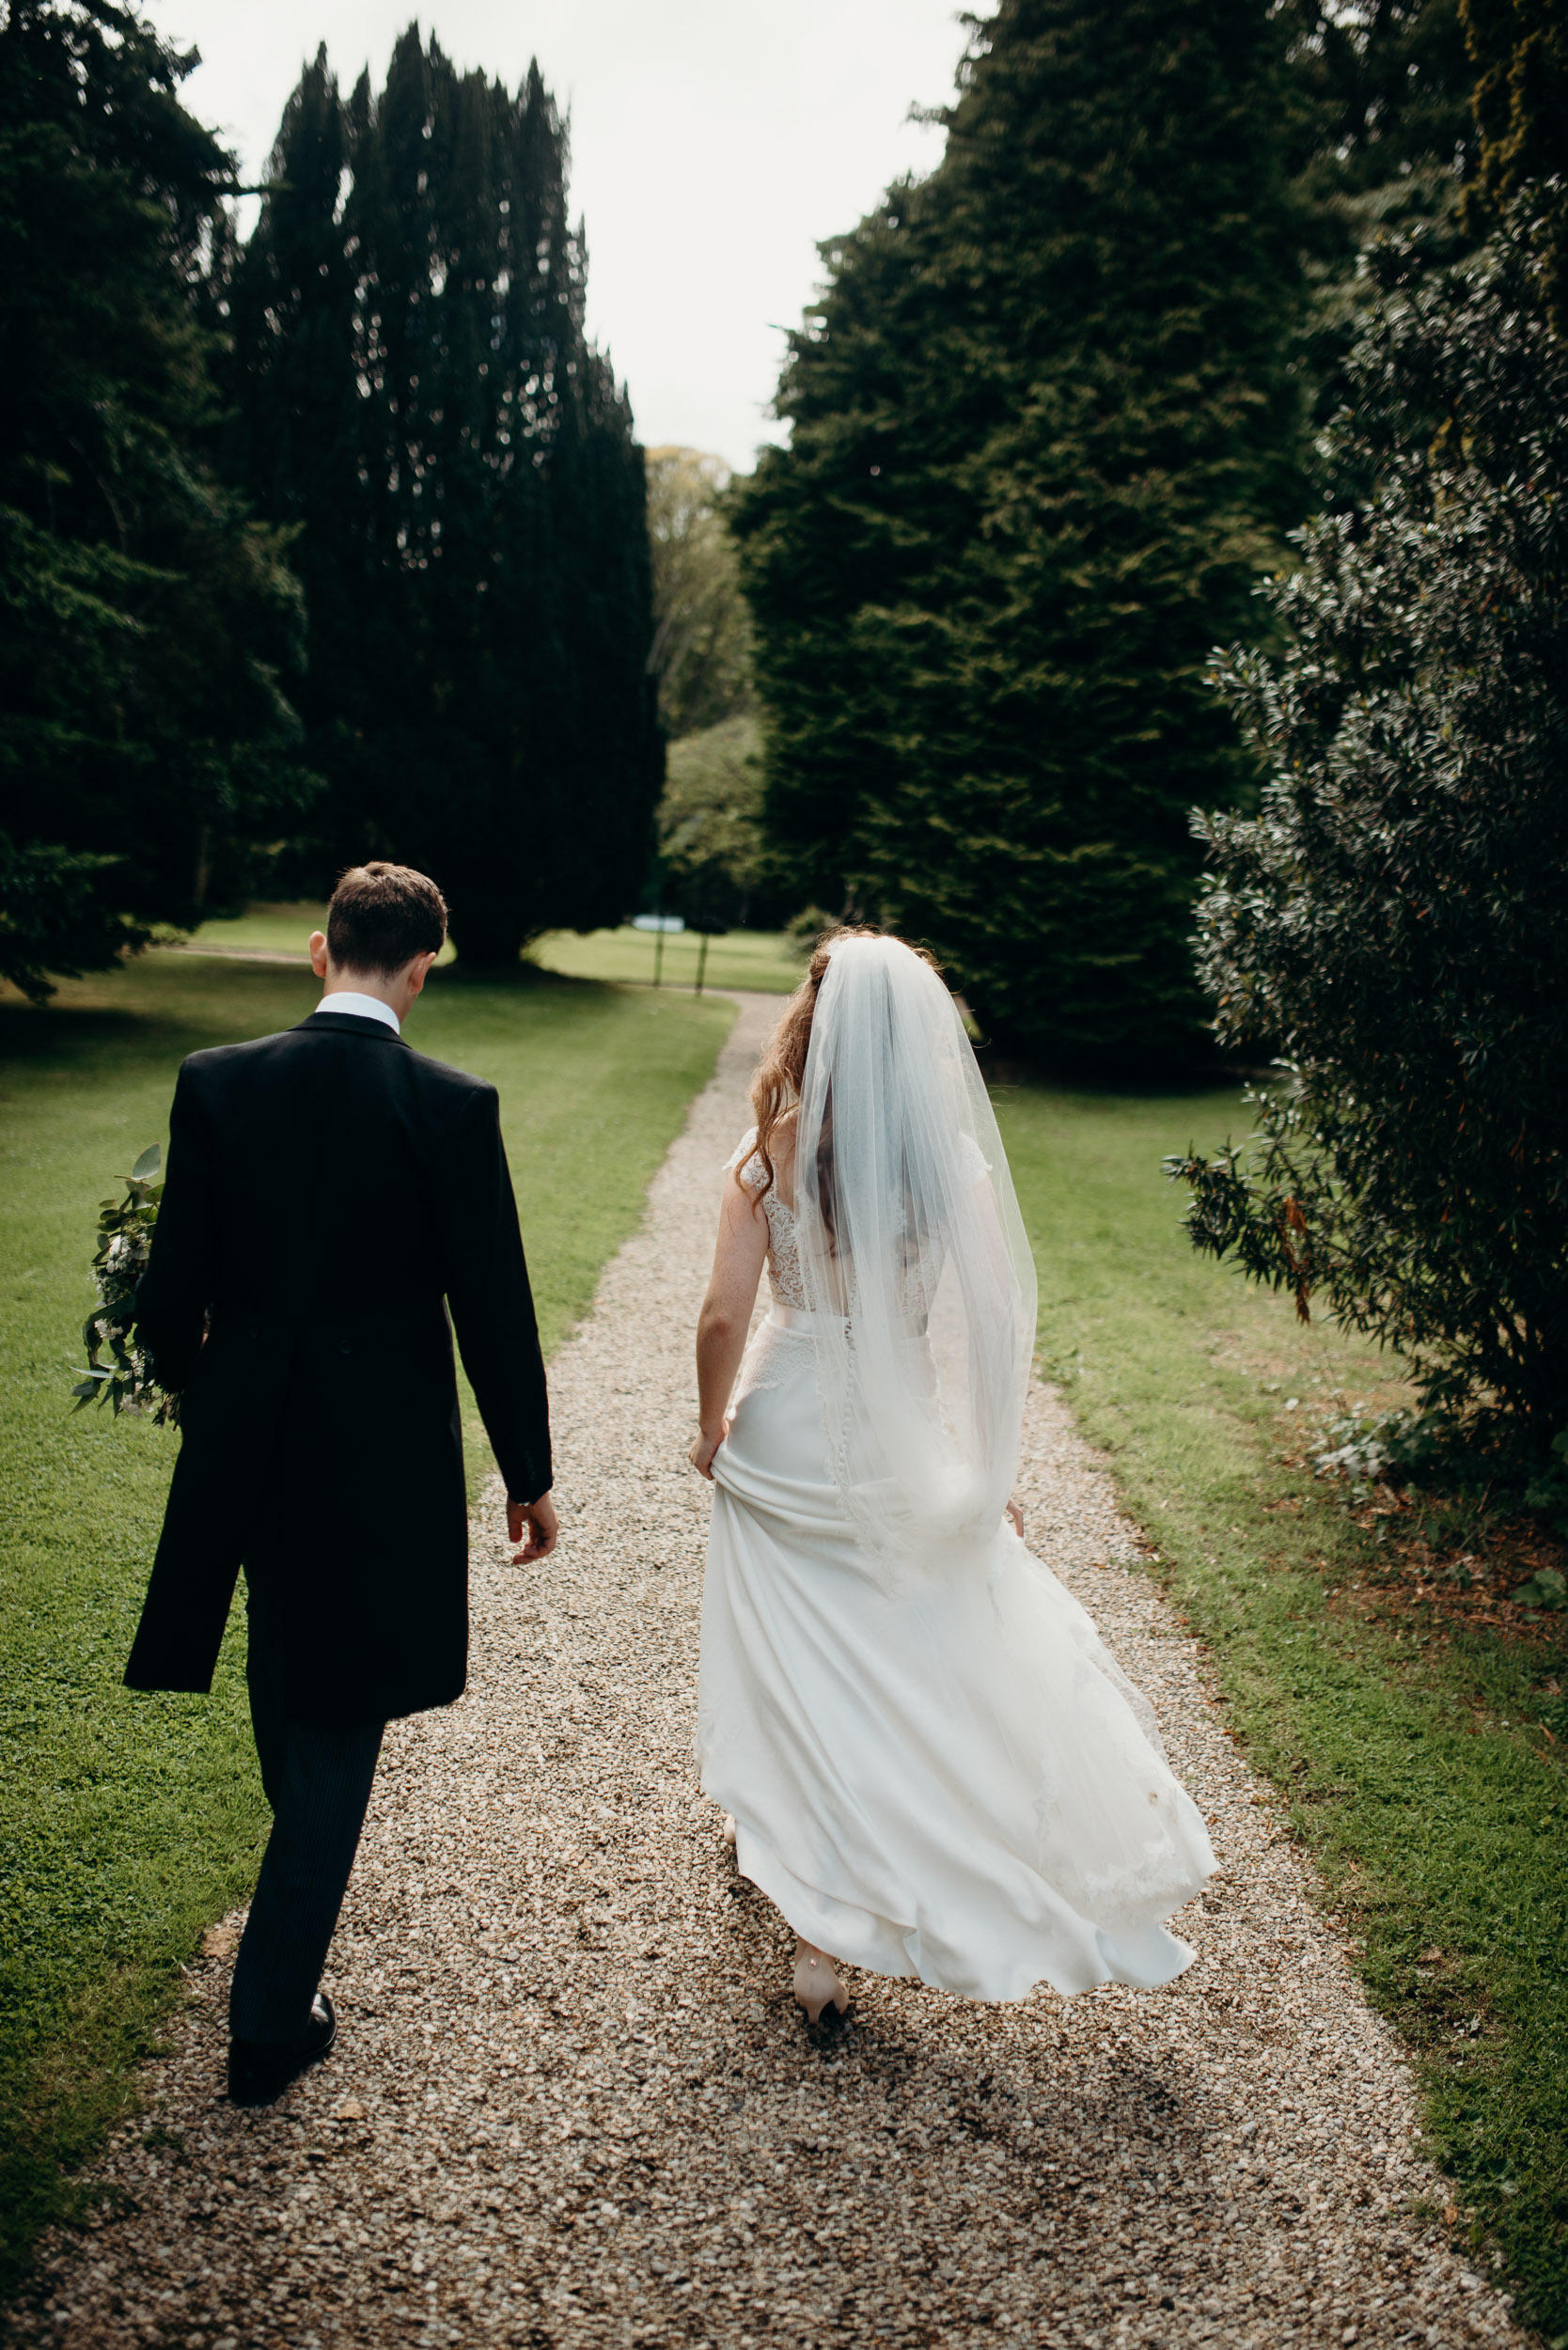 drenagh estate wedding photography-89.jpg